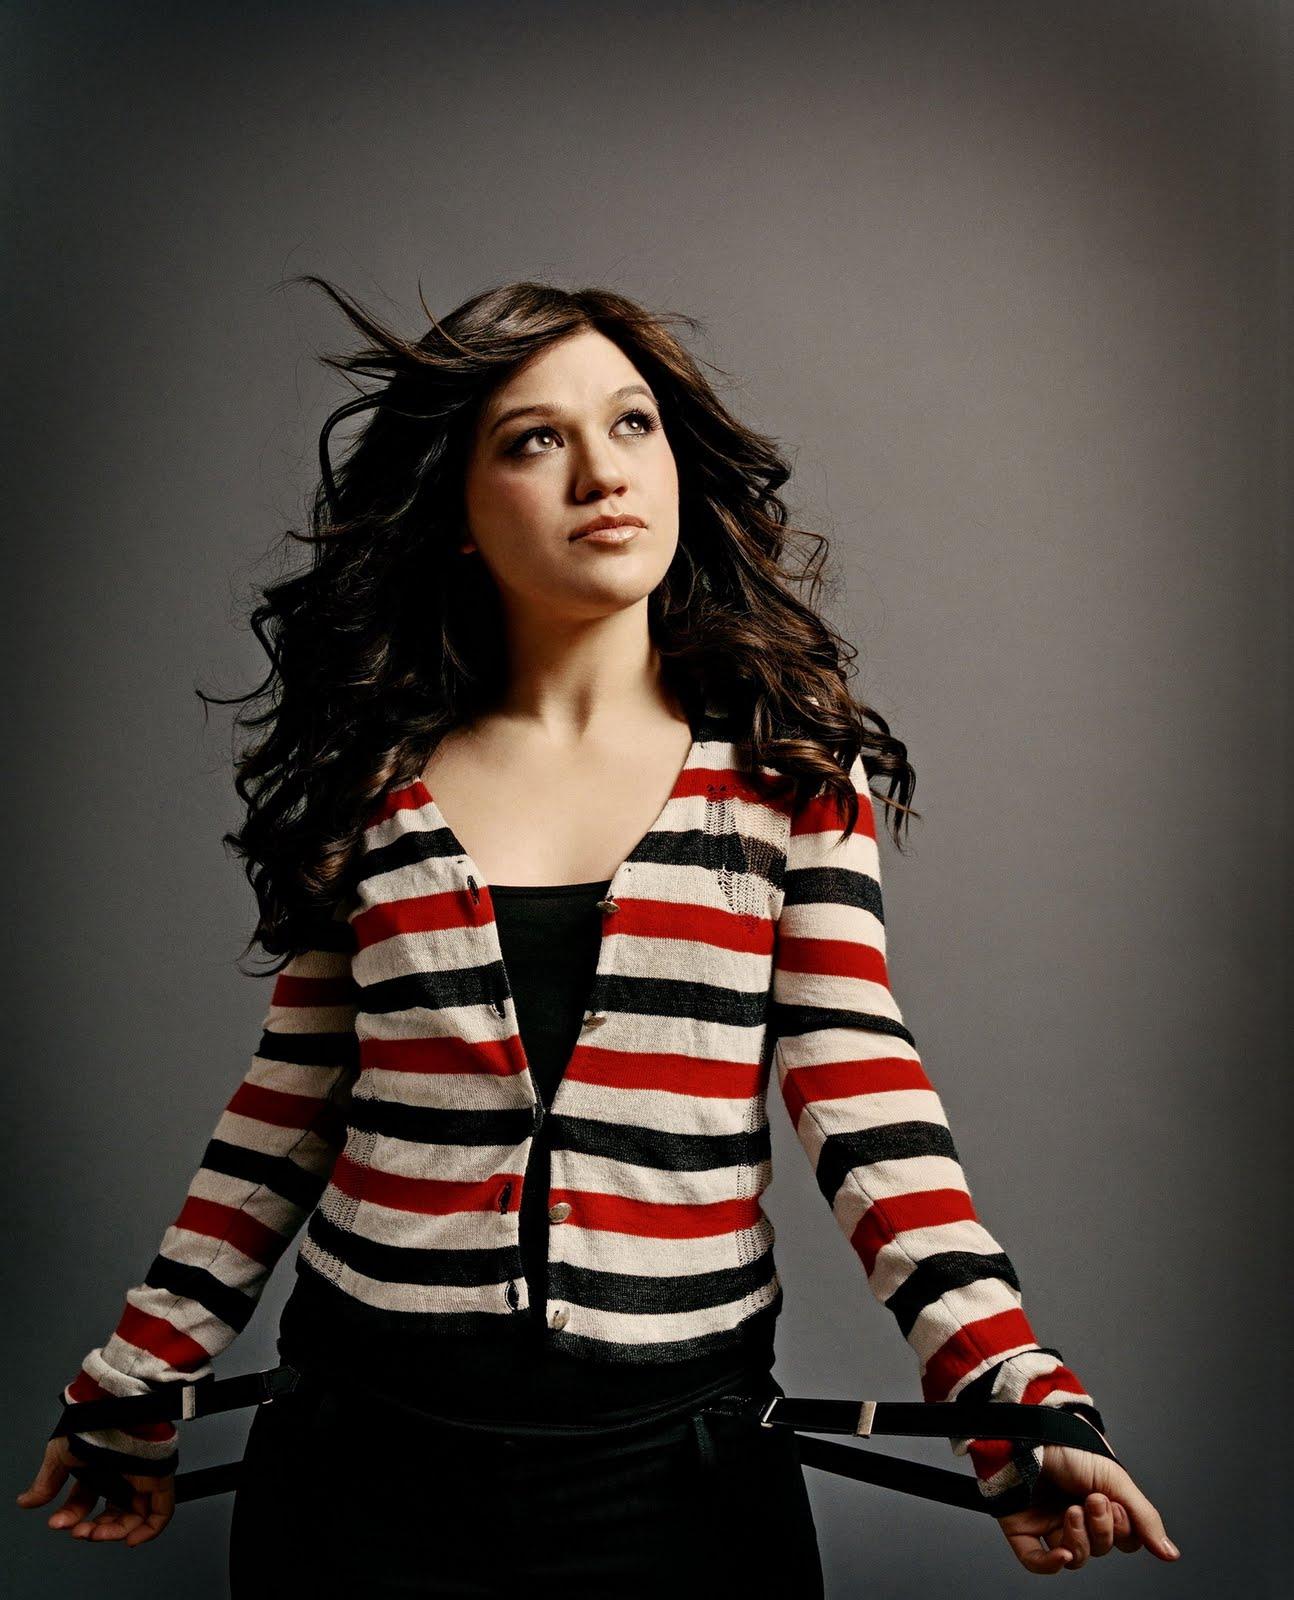 http://4.bp.blogspot.com/-y85a7qgjZsc/TlDgtIcCfkI/AAAAAAAAABI/K1OD-YOZAqg/s1600/Kelly-Clarkson-life-style-2011-american-singer-and-actress-13.jpg